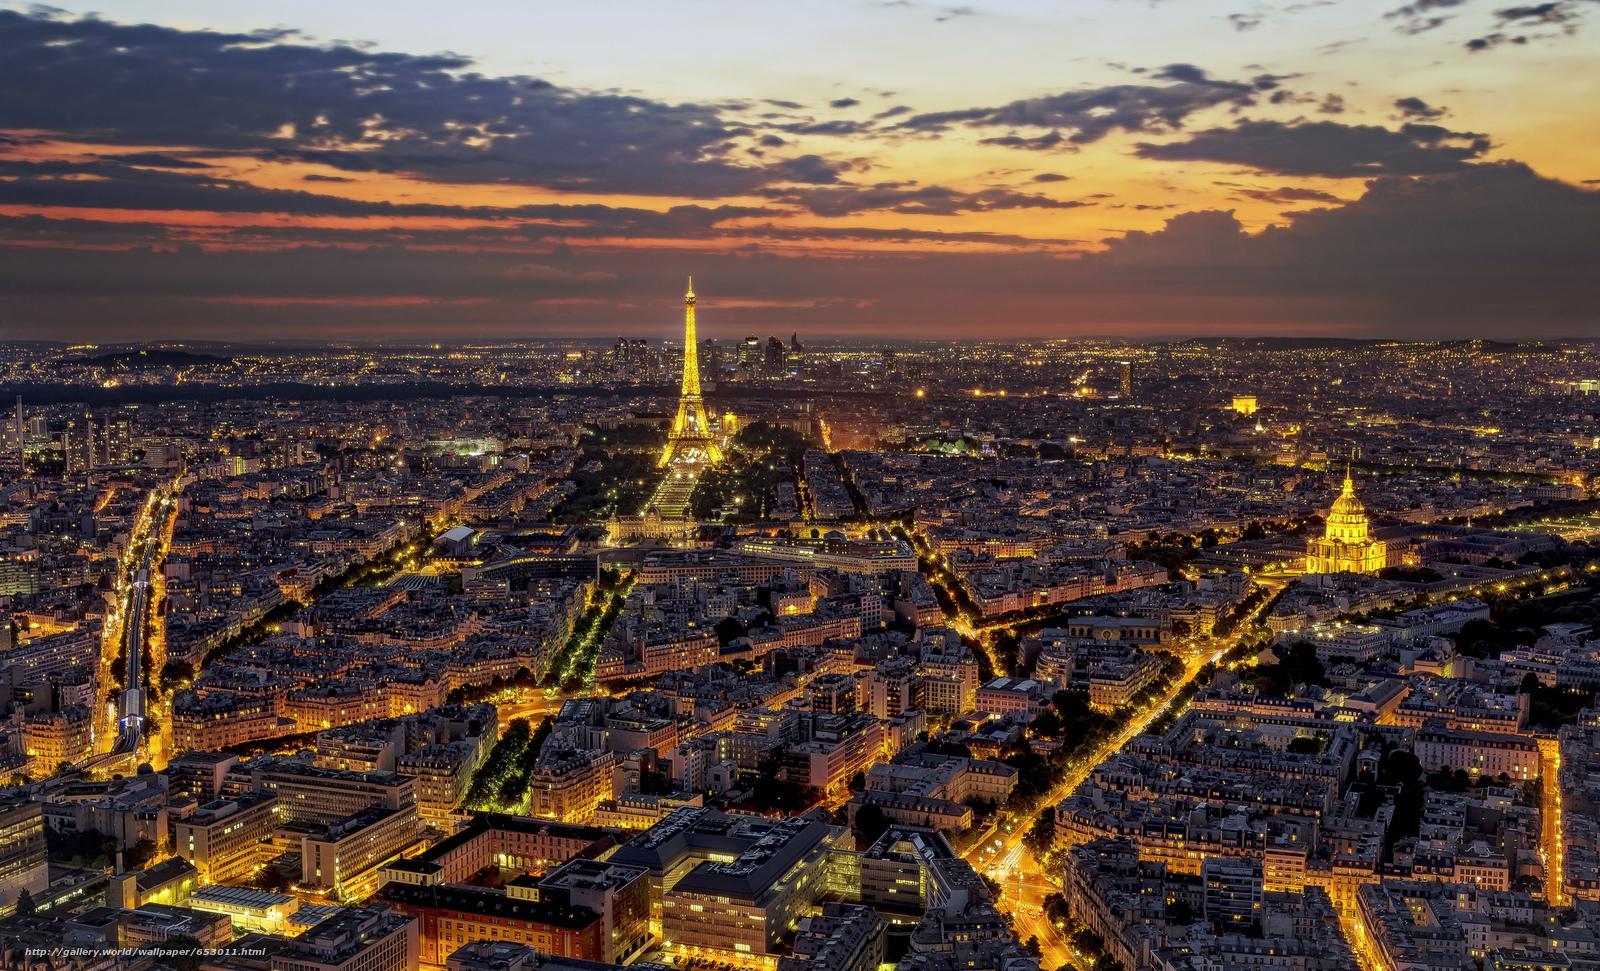 Download wallpaper Paris,  France,  Paris,  France free desktop wallpaper in the resolution 2048x1243 — picture №653011